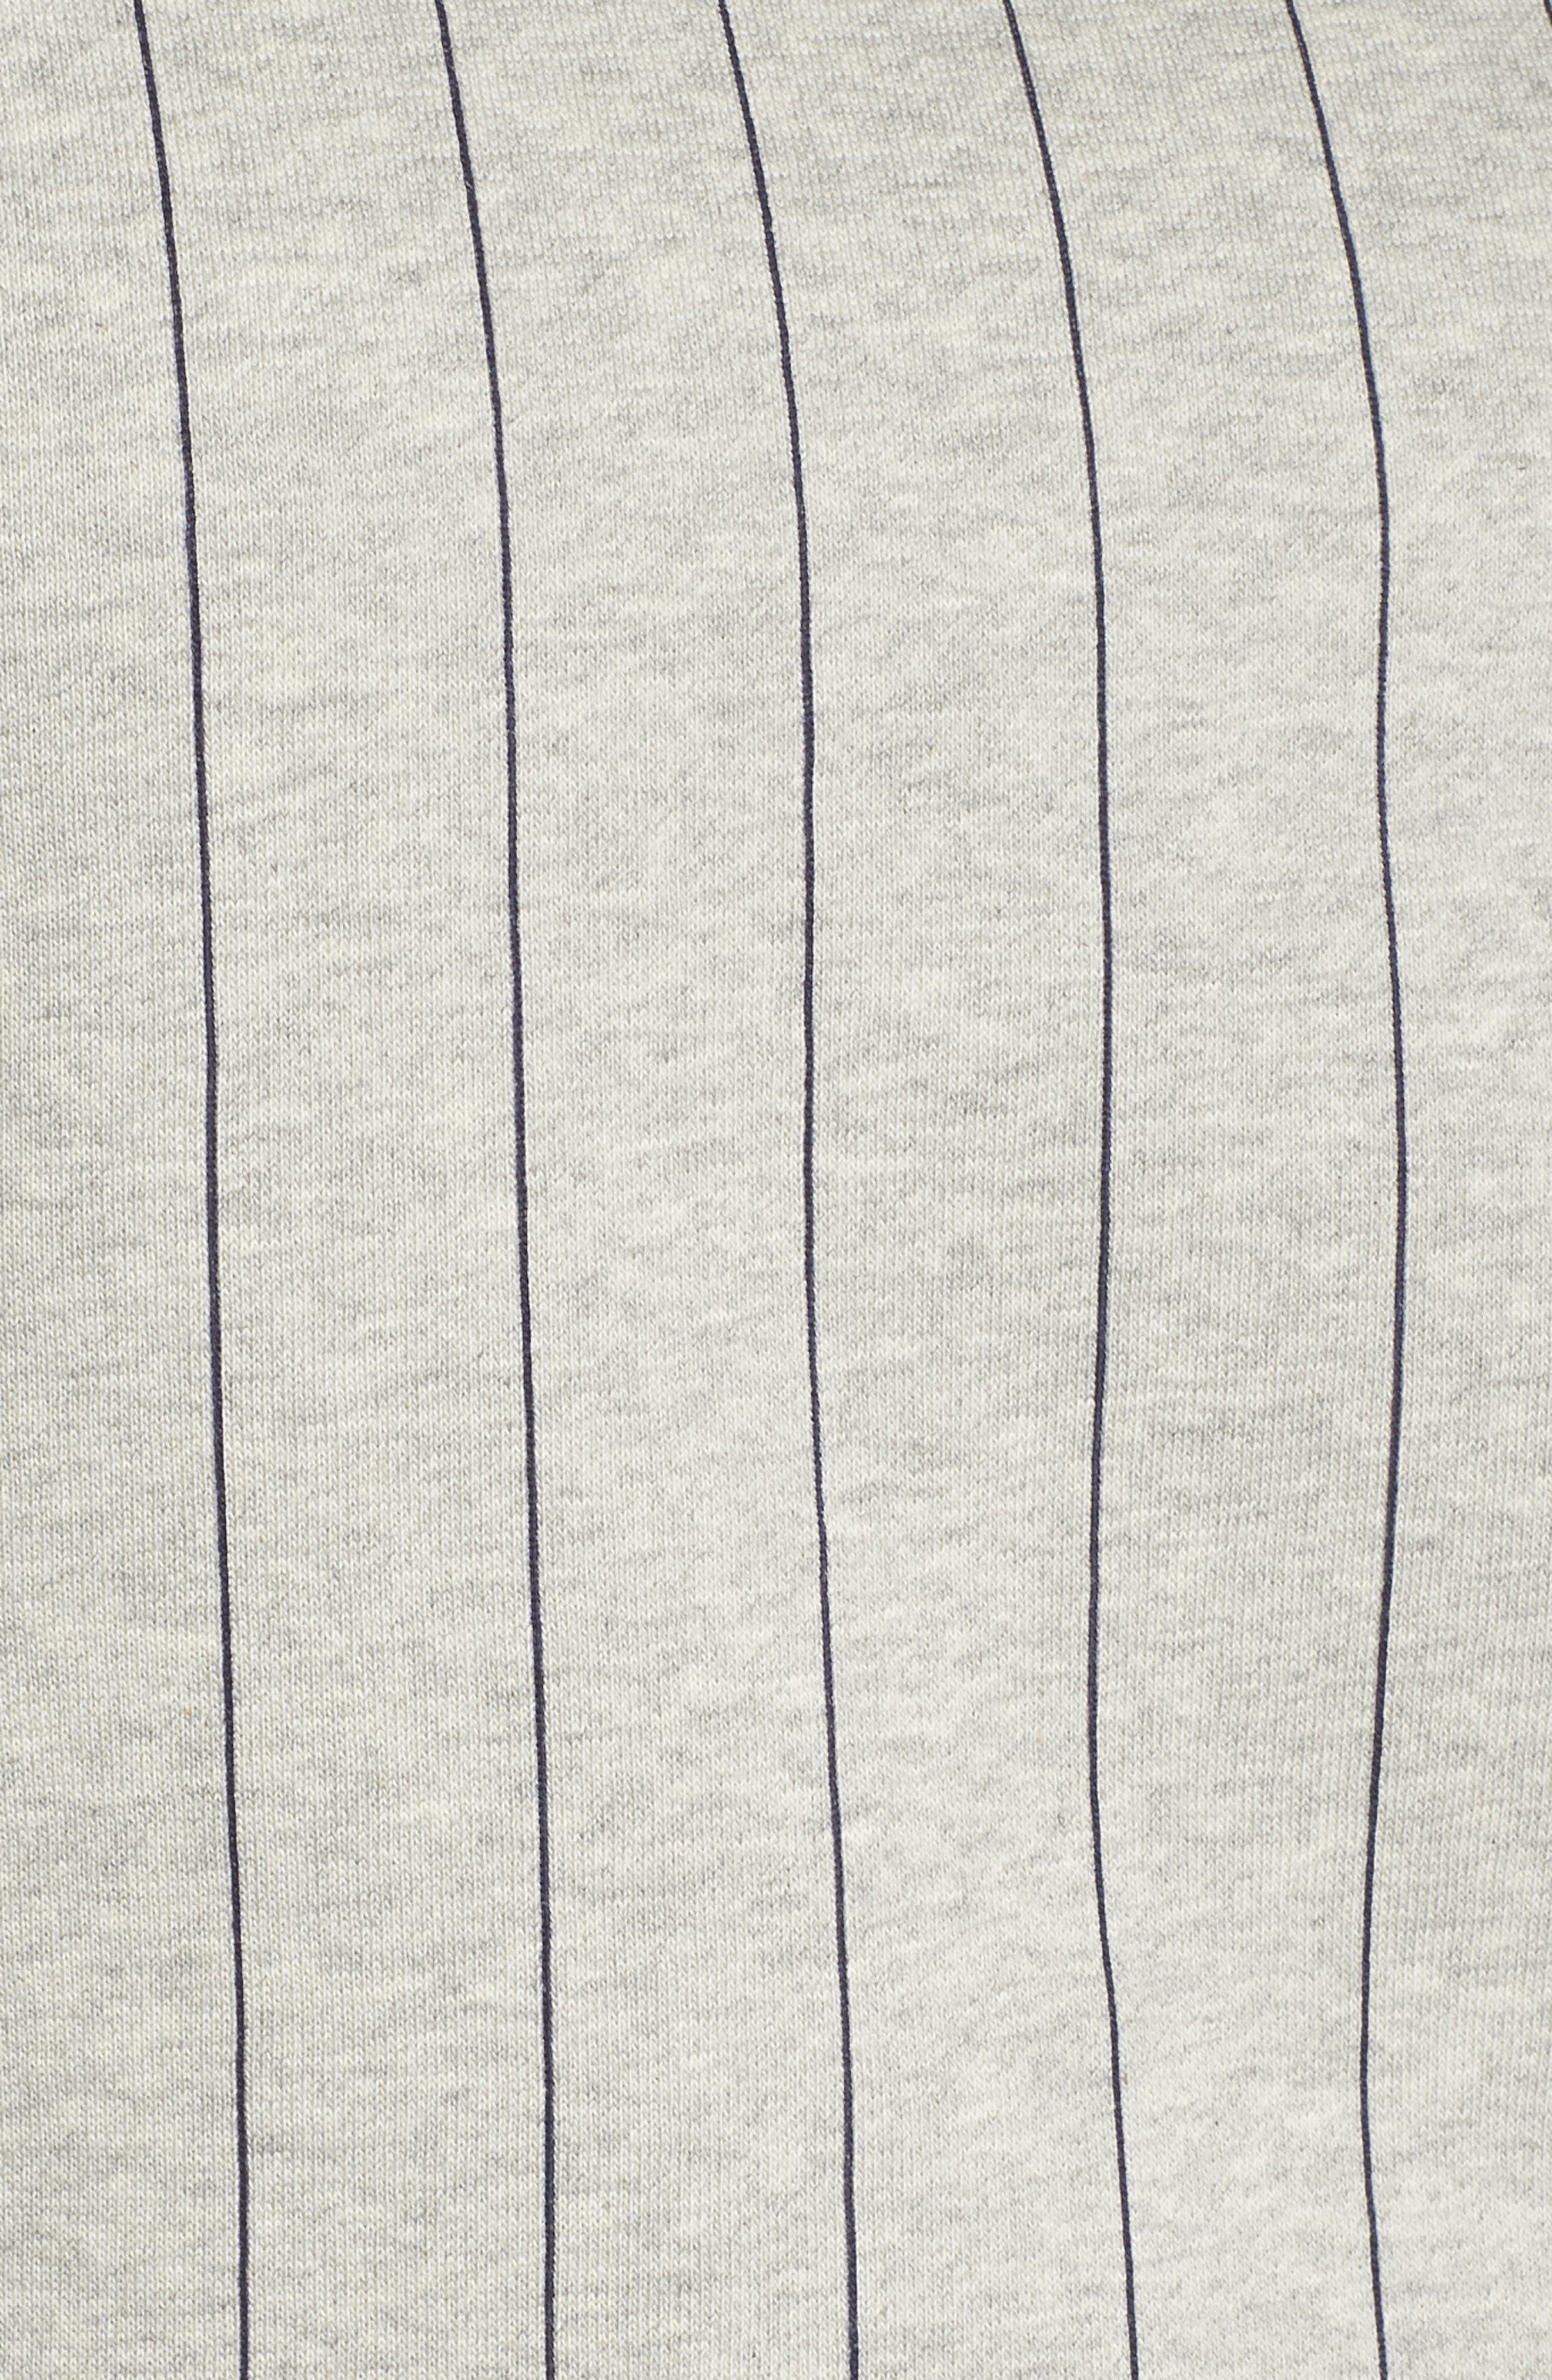 Bren Stripe Sweatshirt,                             Alternate thumbnail 7, color,                             Light Grey Marl/ Peacoat